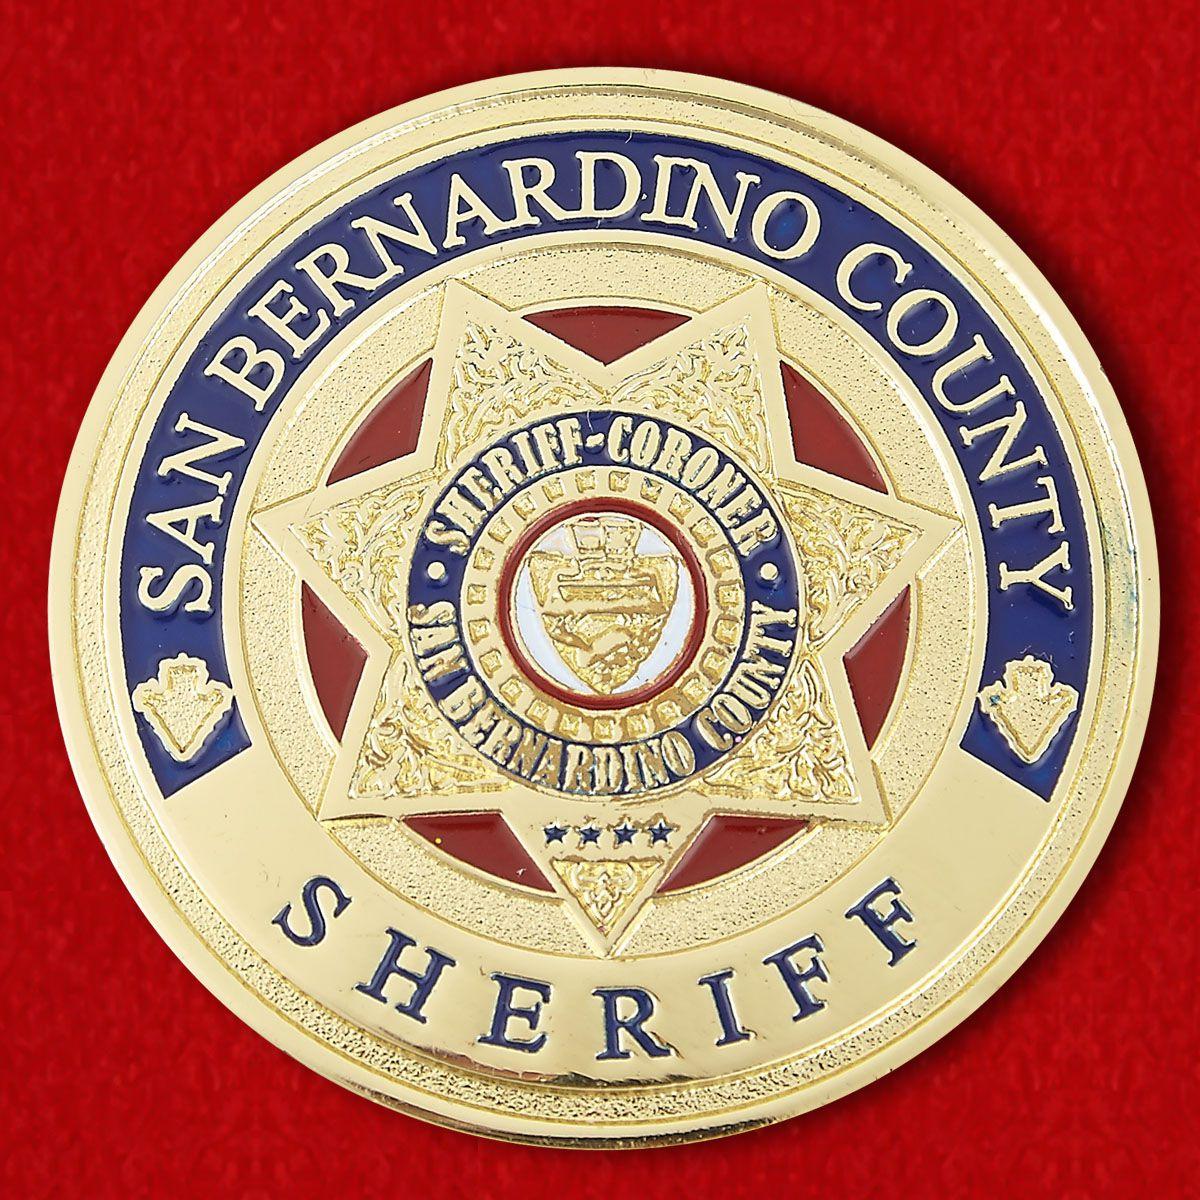 County Sheriff San - Bernardino Challenge Coin